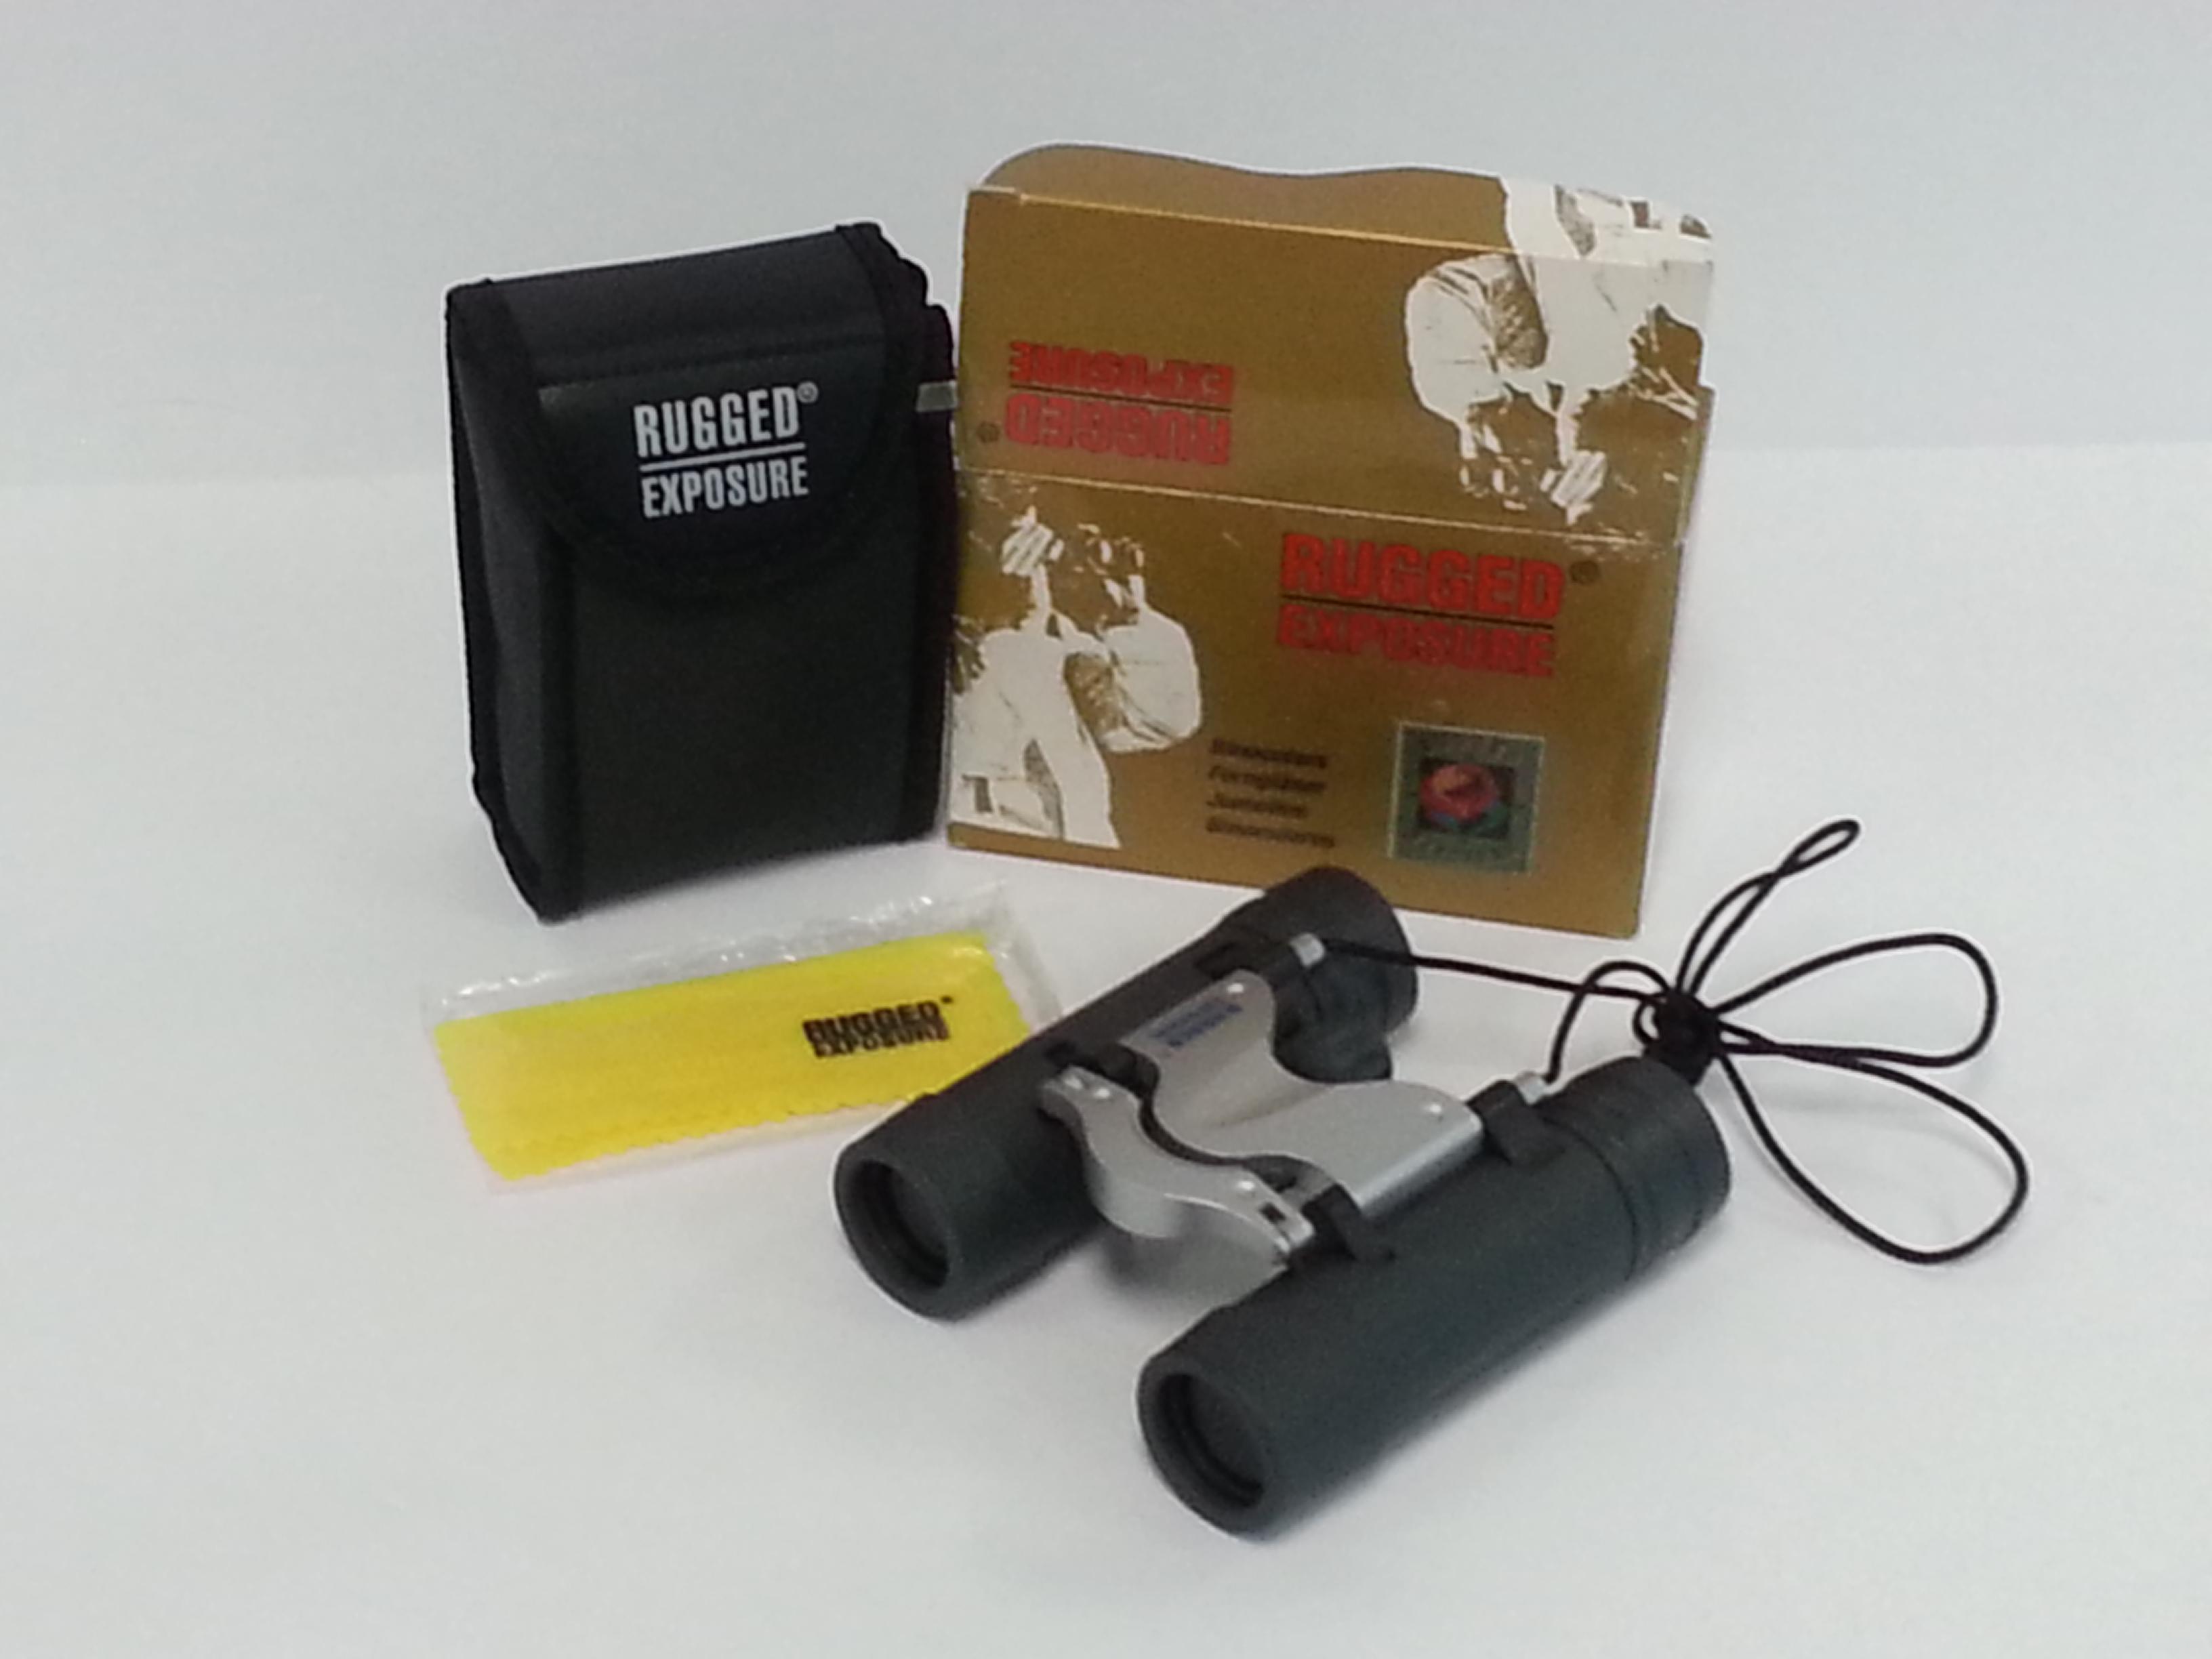 12x25mm Rugged Exposure Compact Binocular